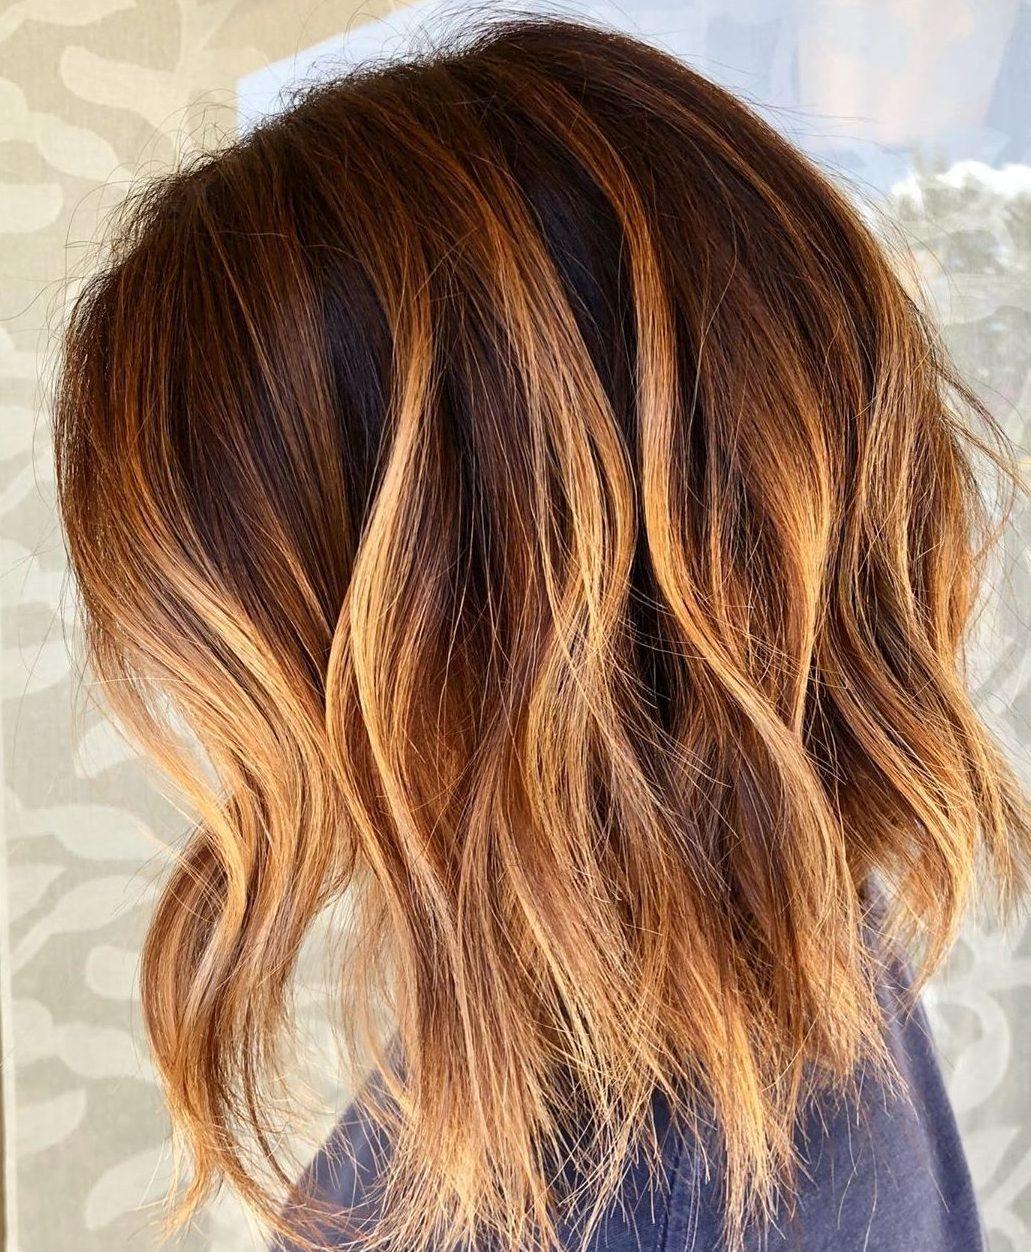 wavy bob hairstyles with bangs